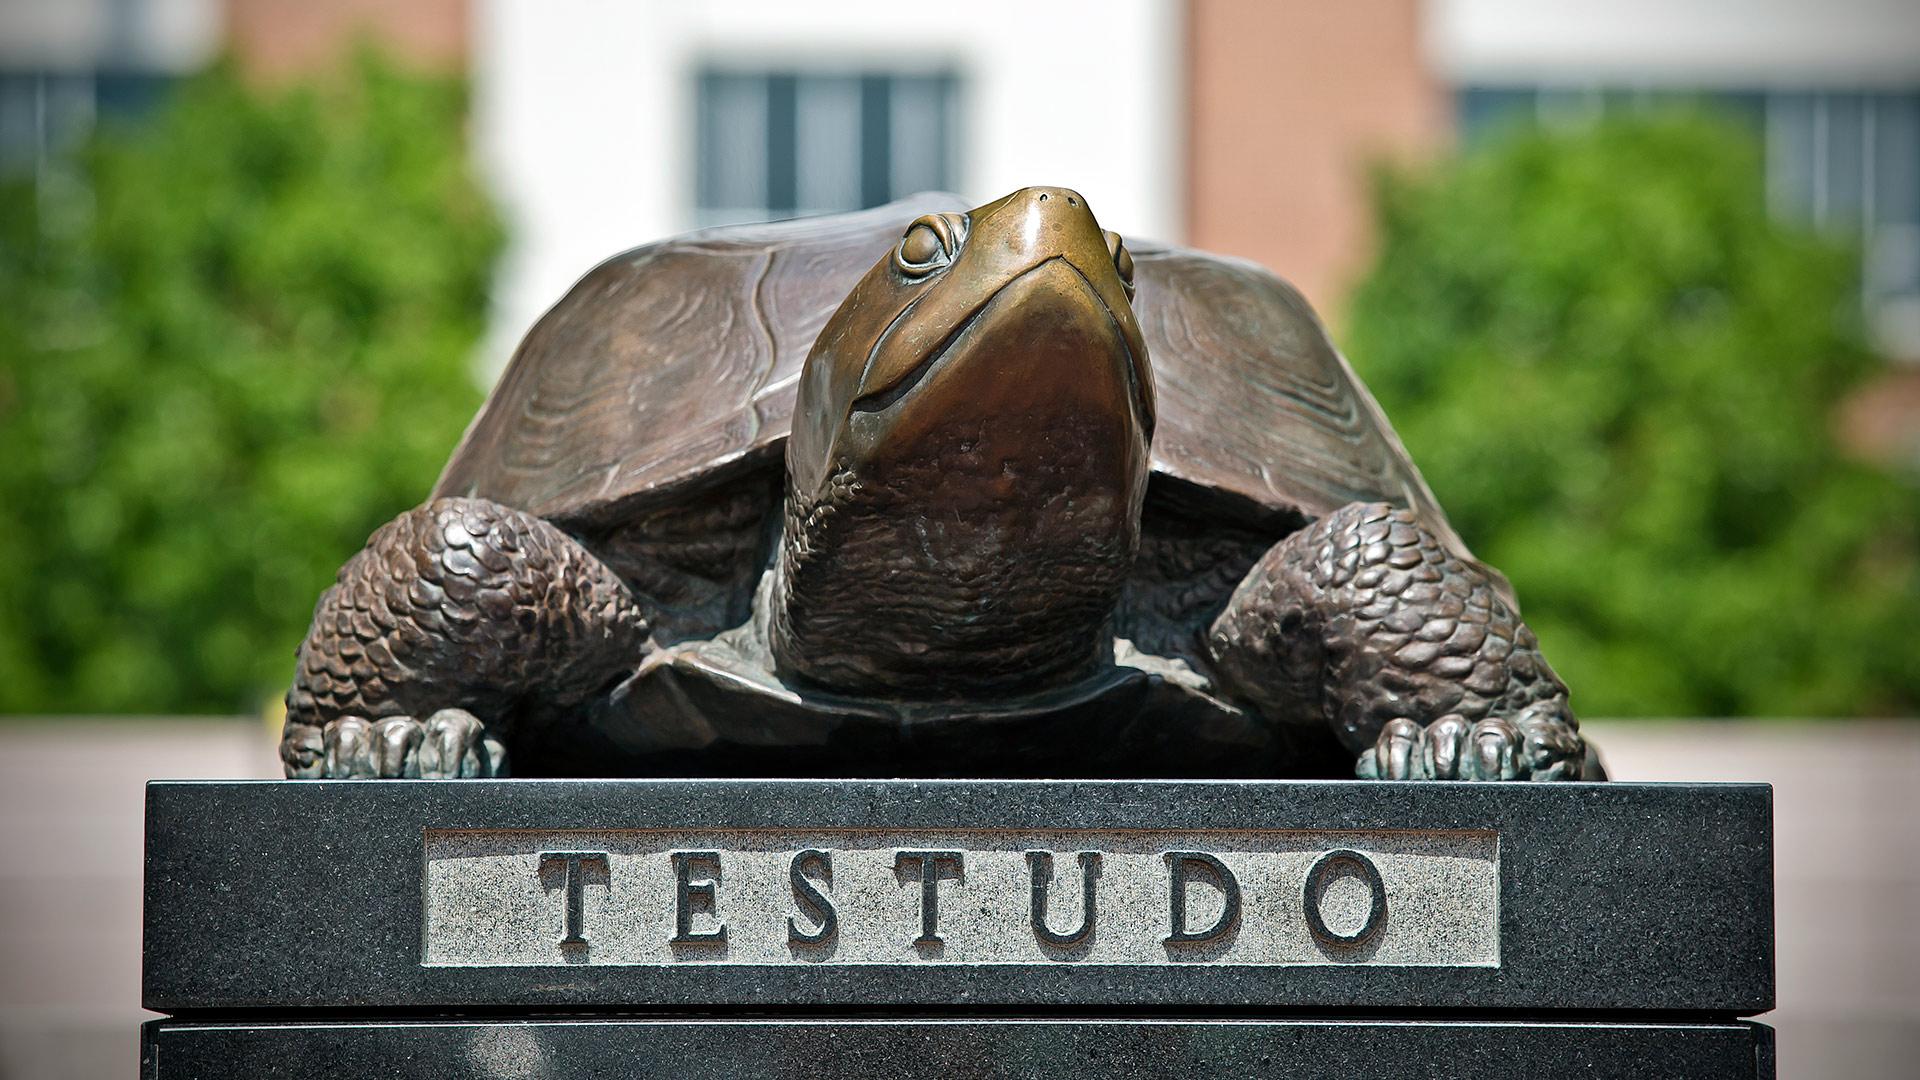 Testudo Sculpture